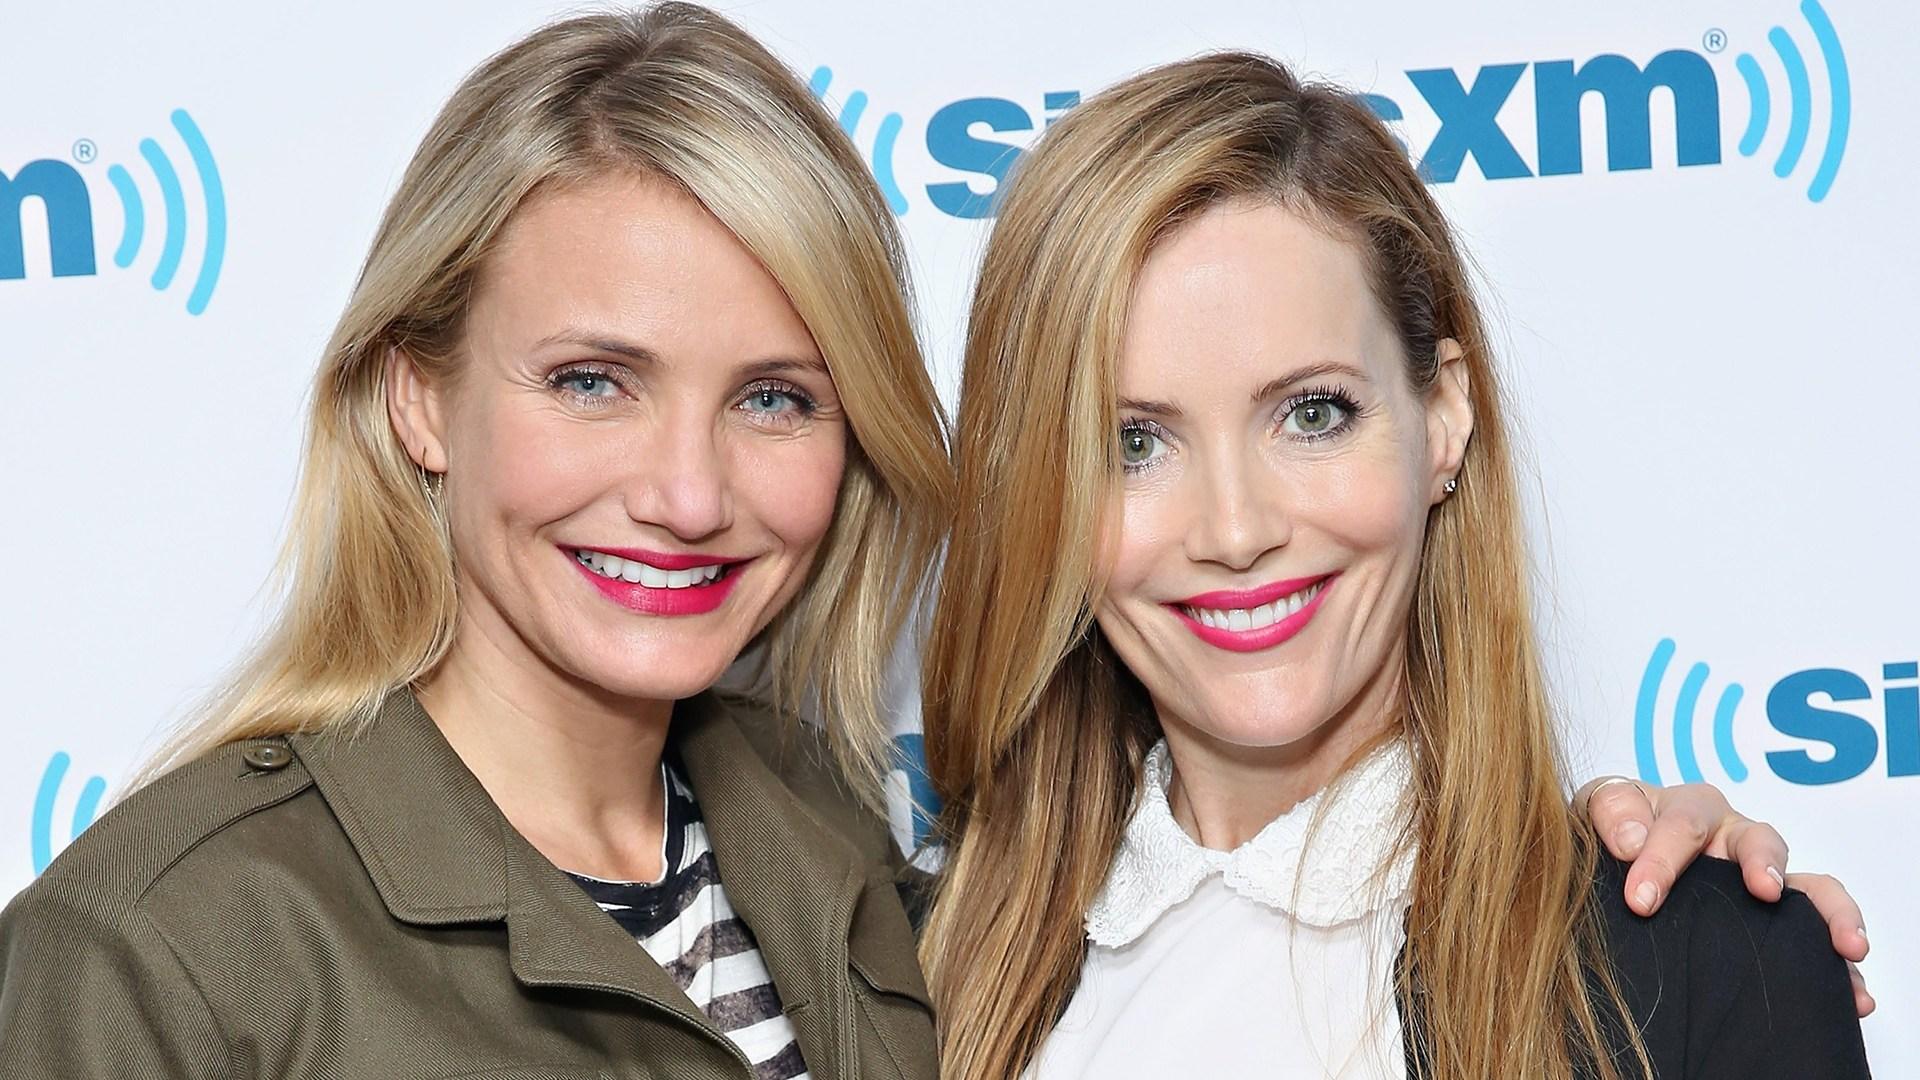 Image: Celebrities Visit SiriusXM Studios - April 23, 2014